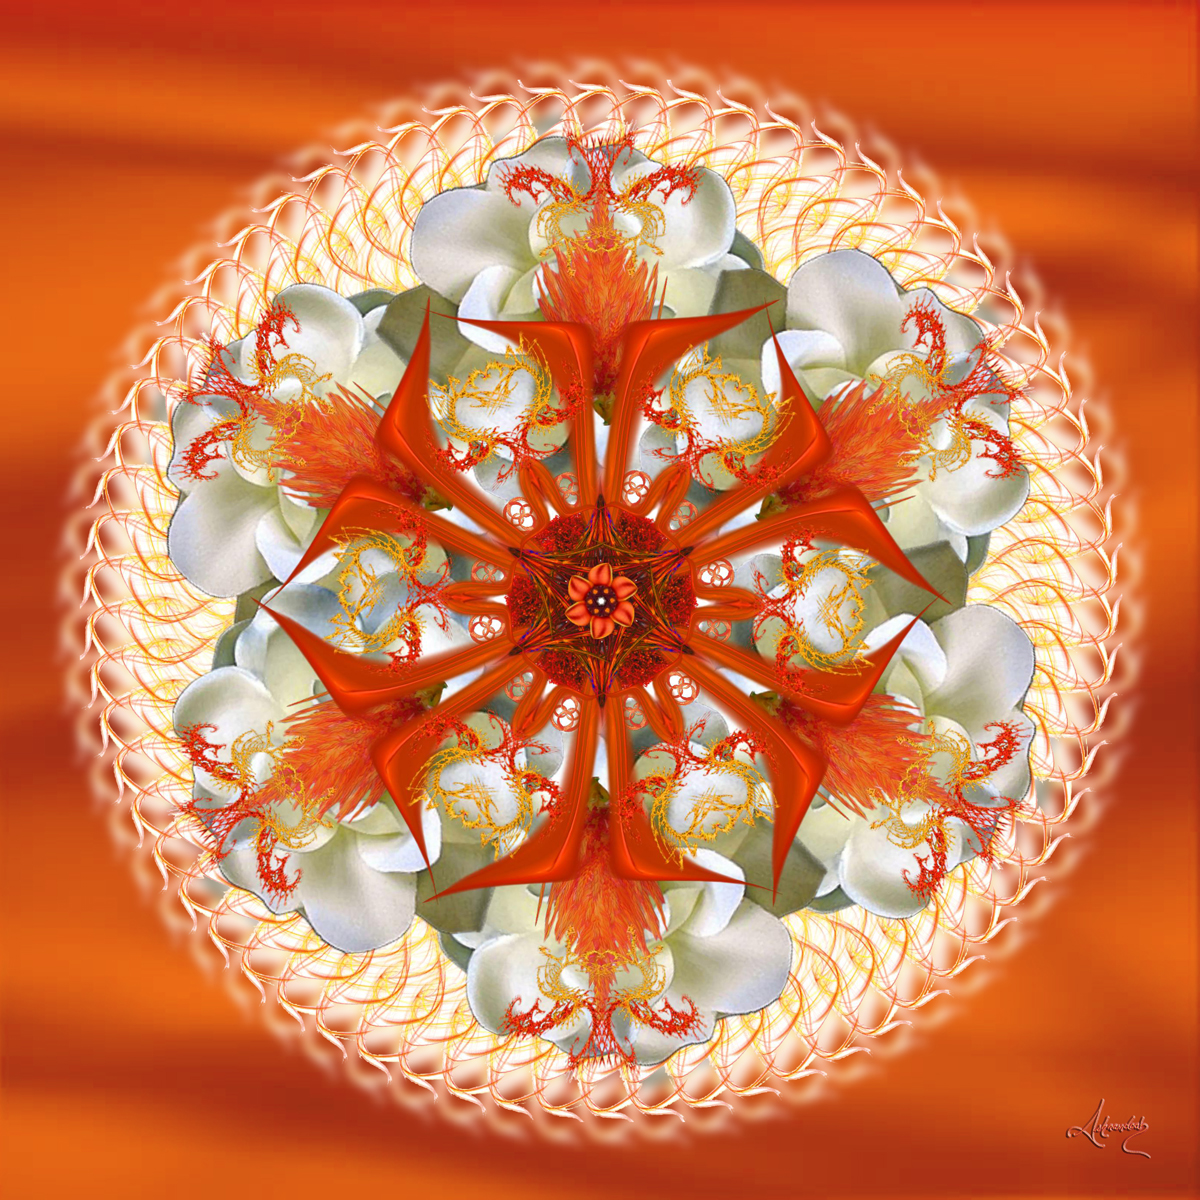 sacral chakra Activator